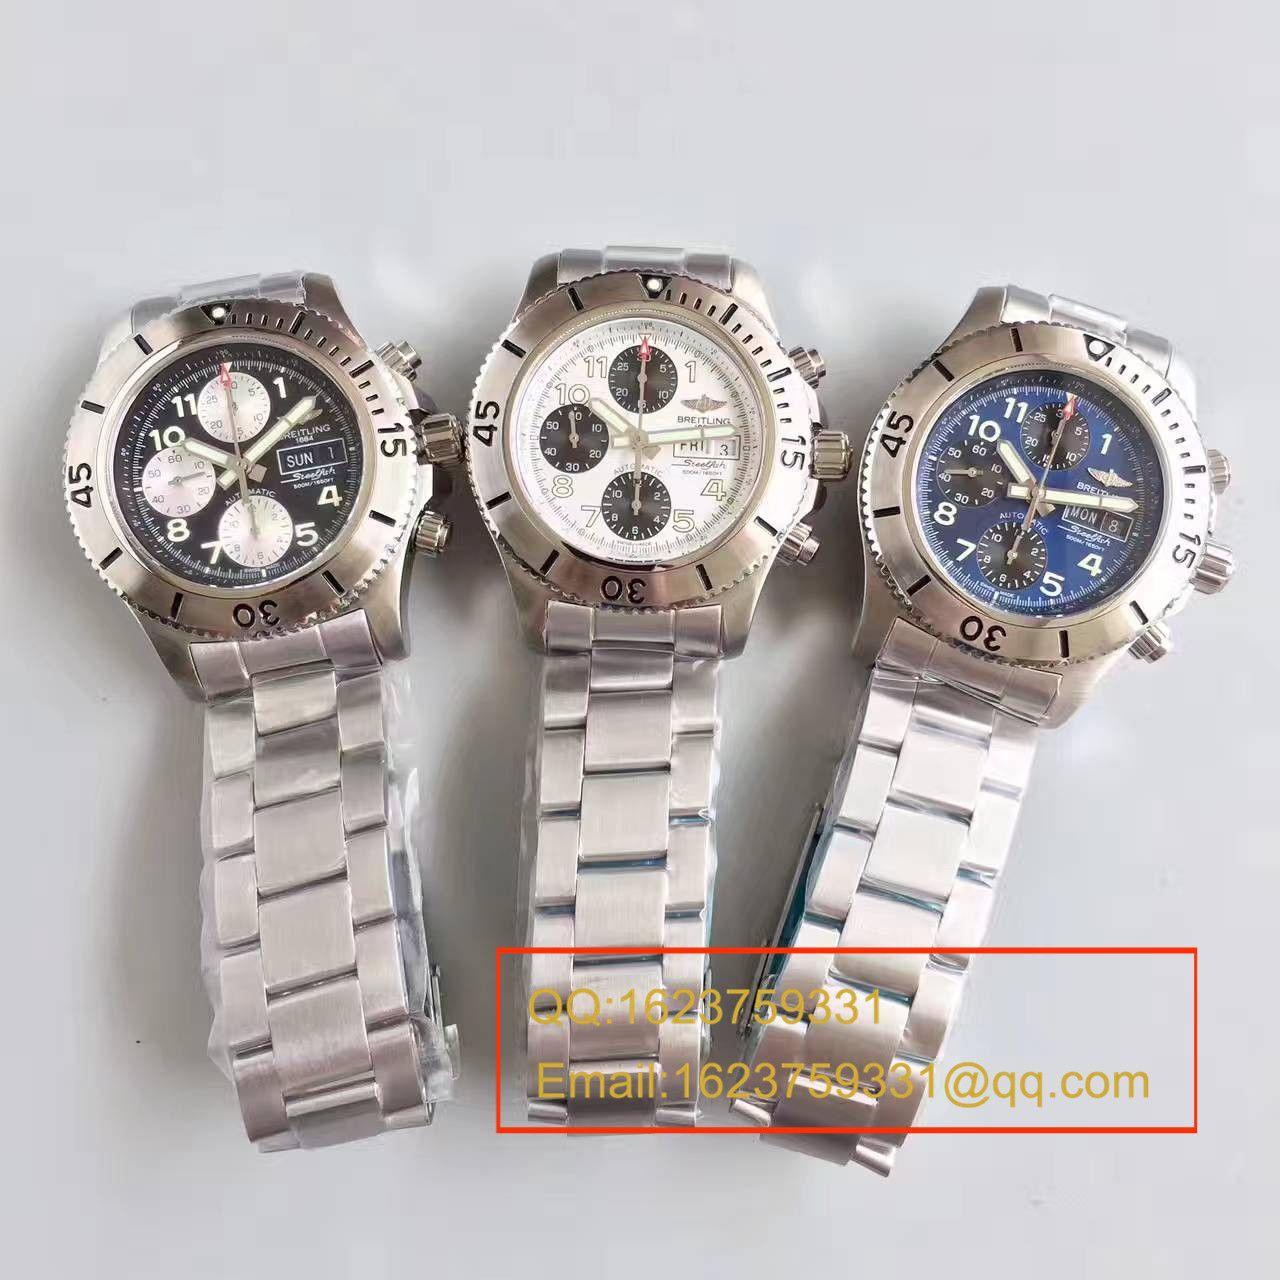 【GF厂一比一复刻手表】百年灵超级海洋系列A13341C3/BD19/162A钢鱼计时腕表 / BL072